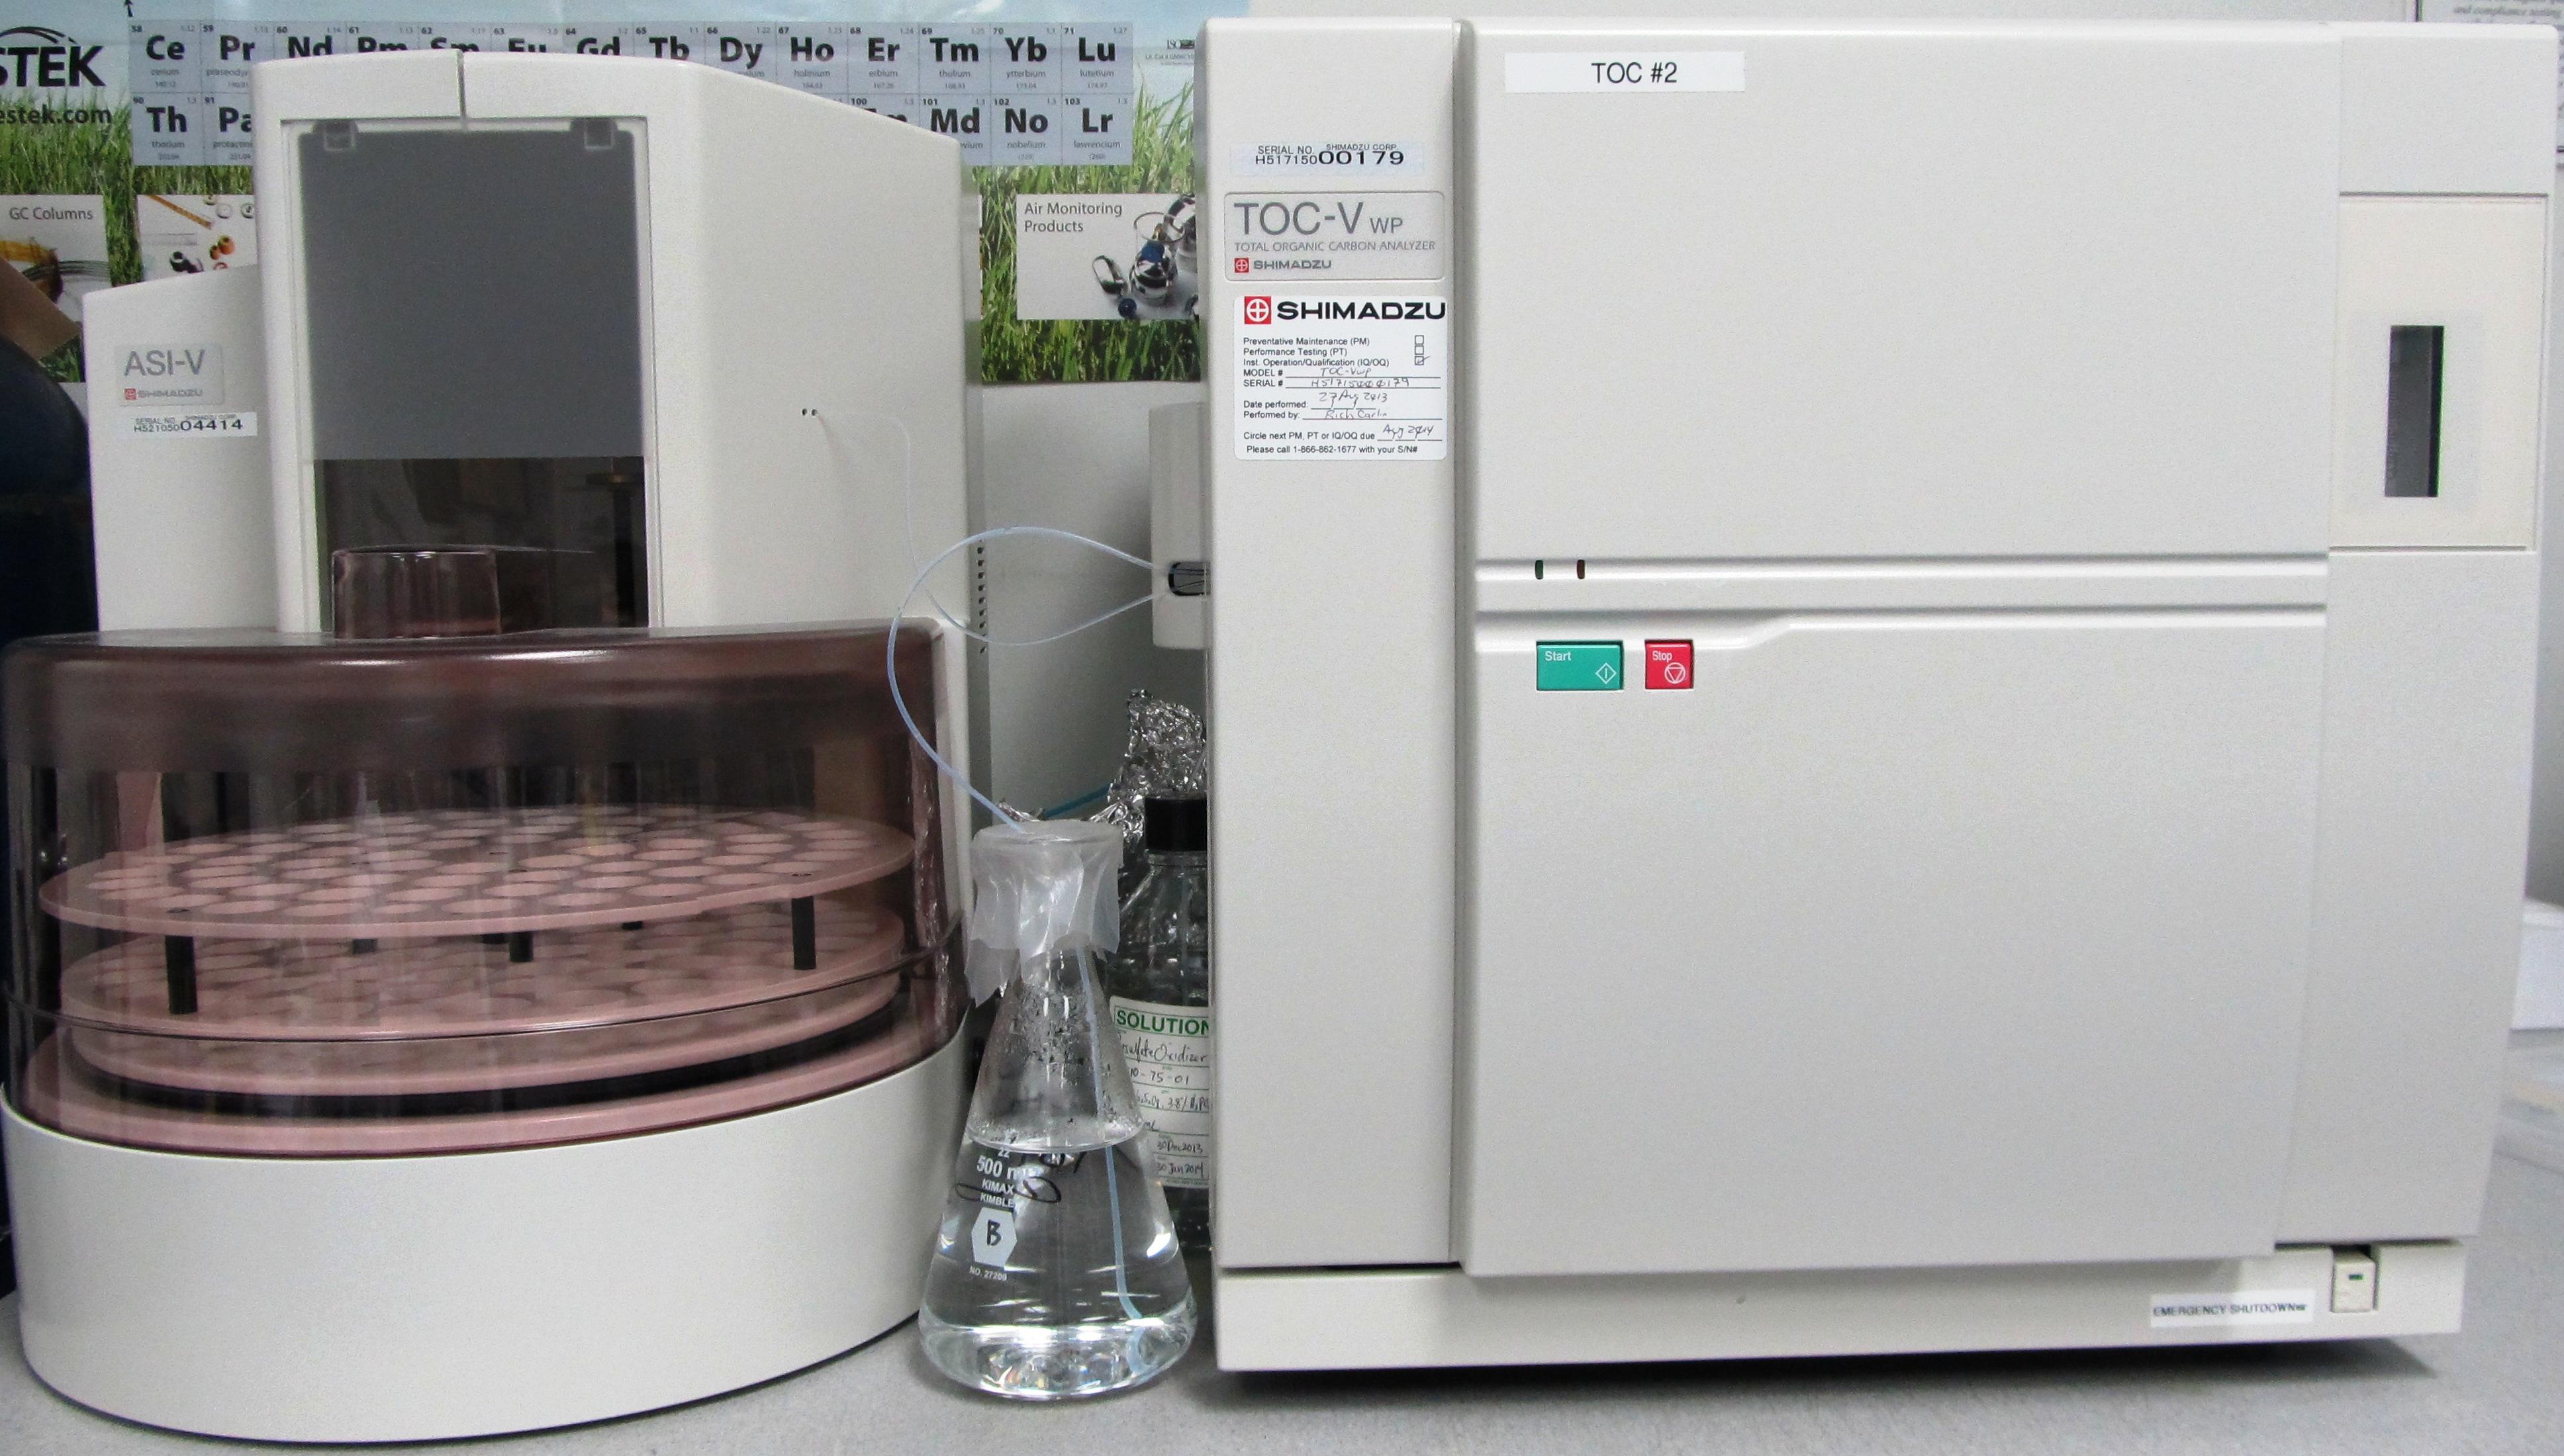 cf天龙模型vwp_figure  : shimadzu toc-vwp total organic carbon instrument